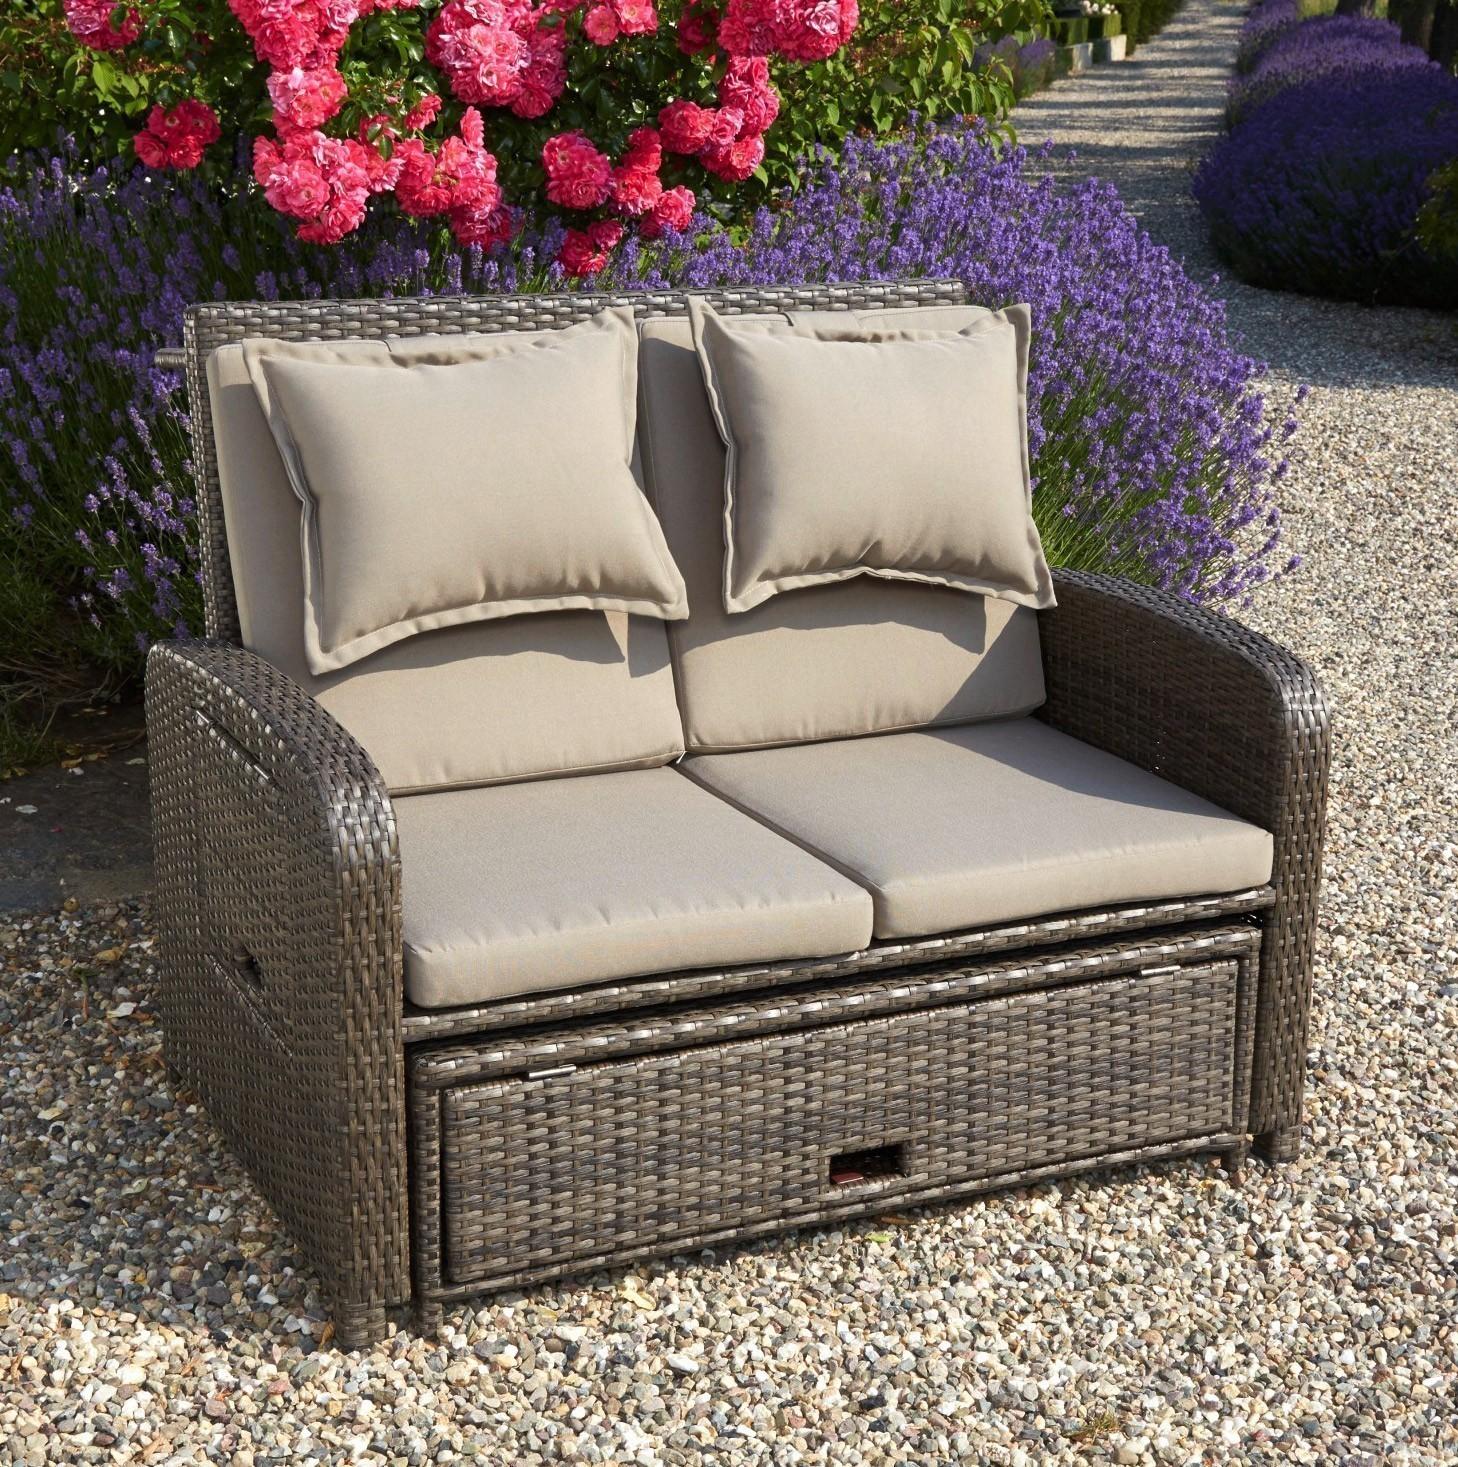 gartensofa lounge liege bahia rondo greenmotion. Black Bedroom Furniture Sets. Home Design Ideas